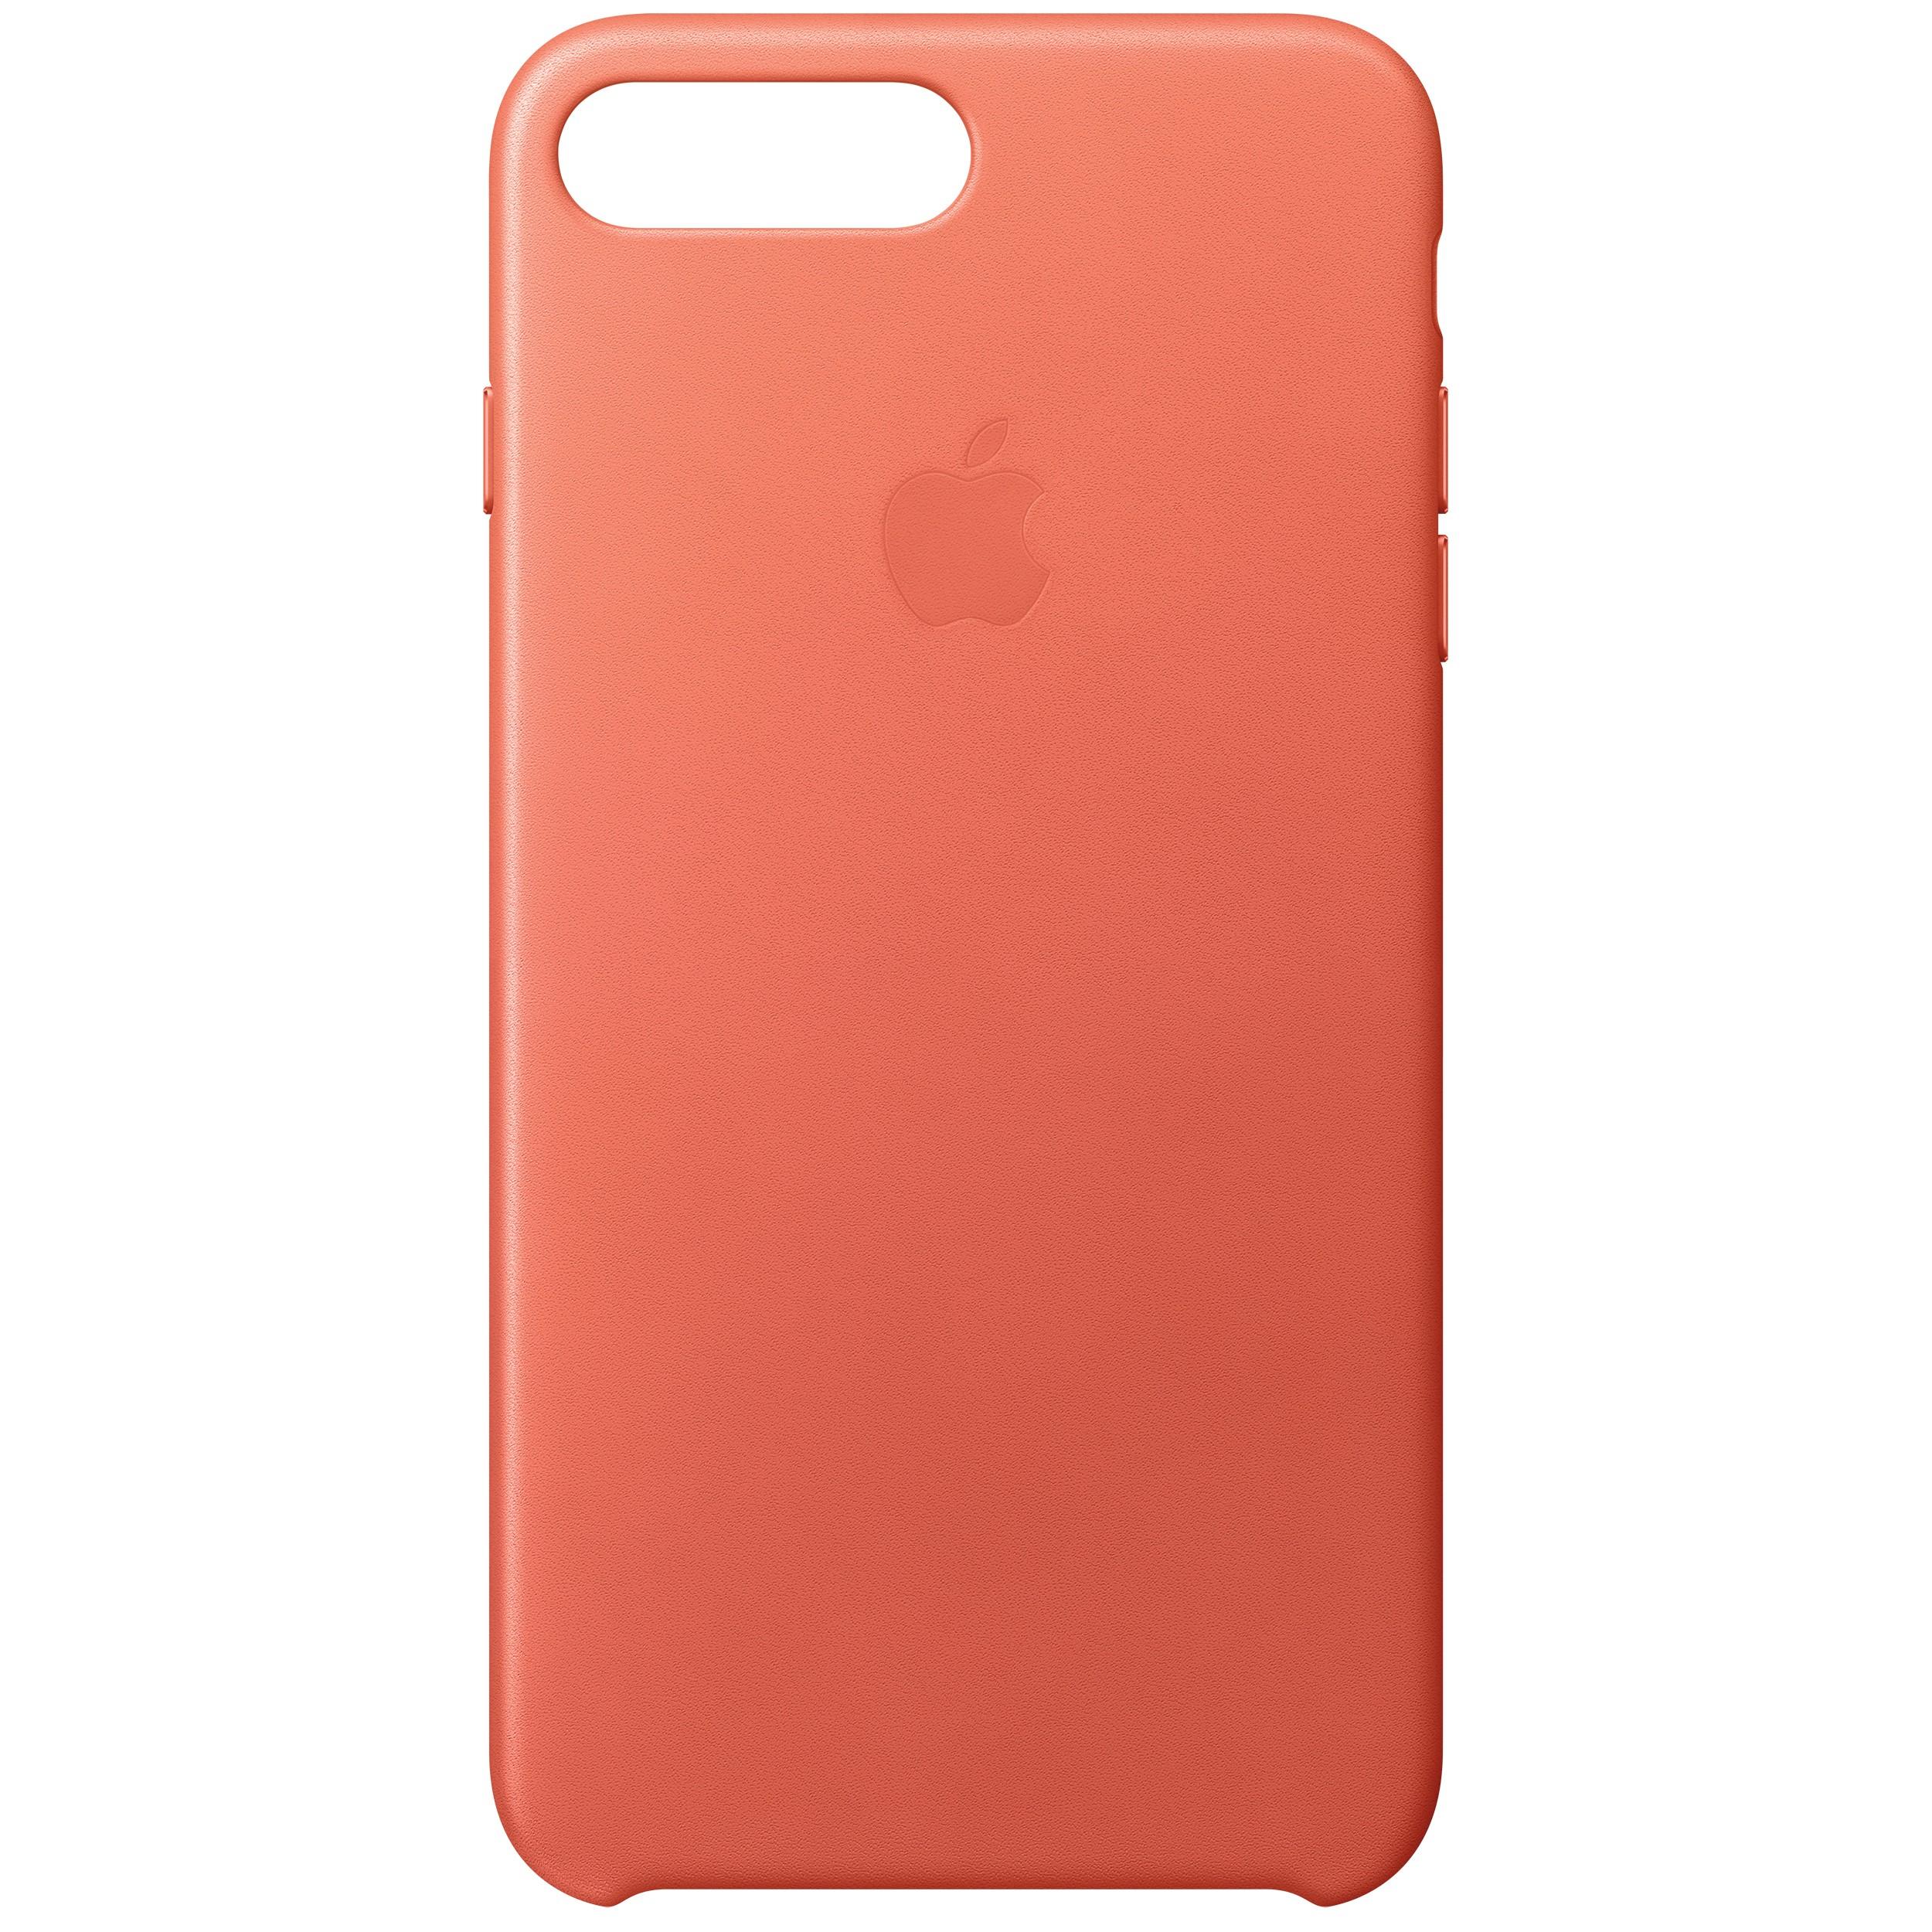 MQ5H2ZM/A : Apple iPhone 7 Plus skinndeksel (geranium pink)